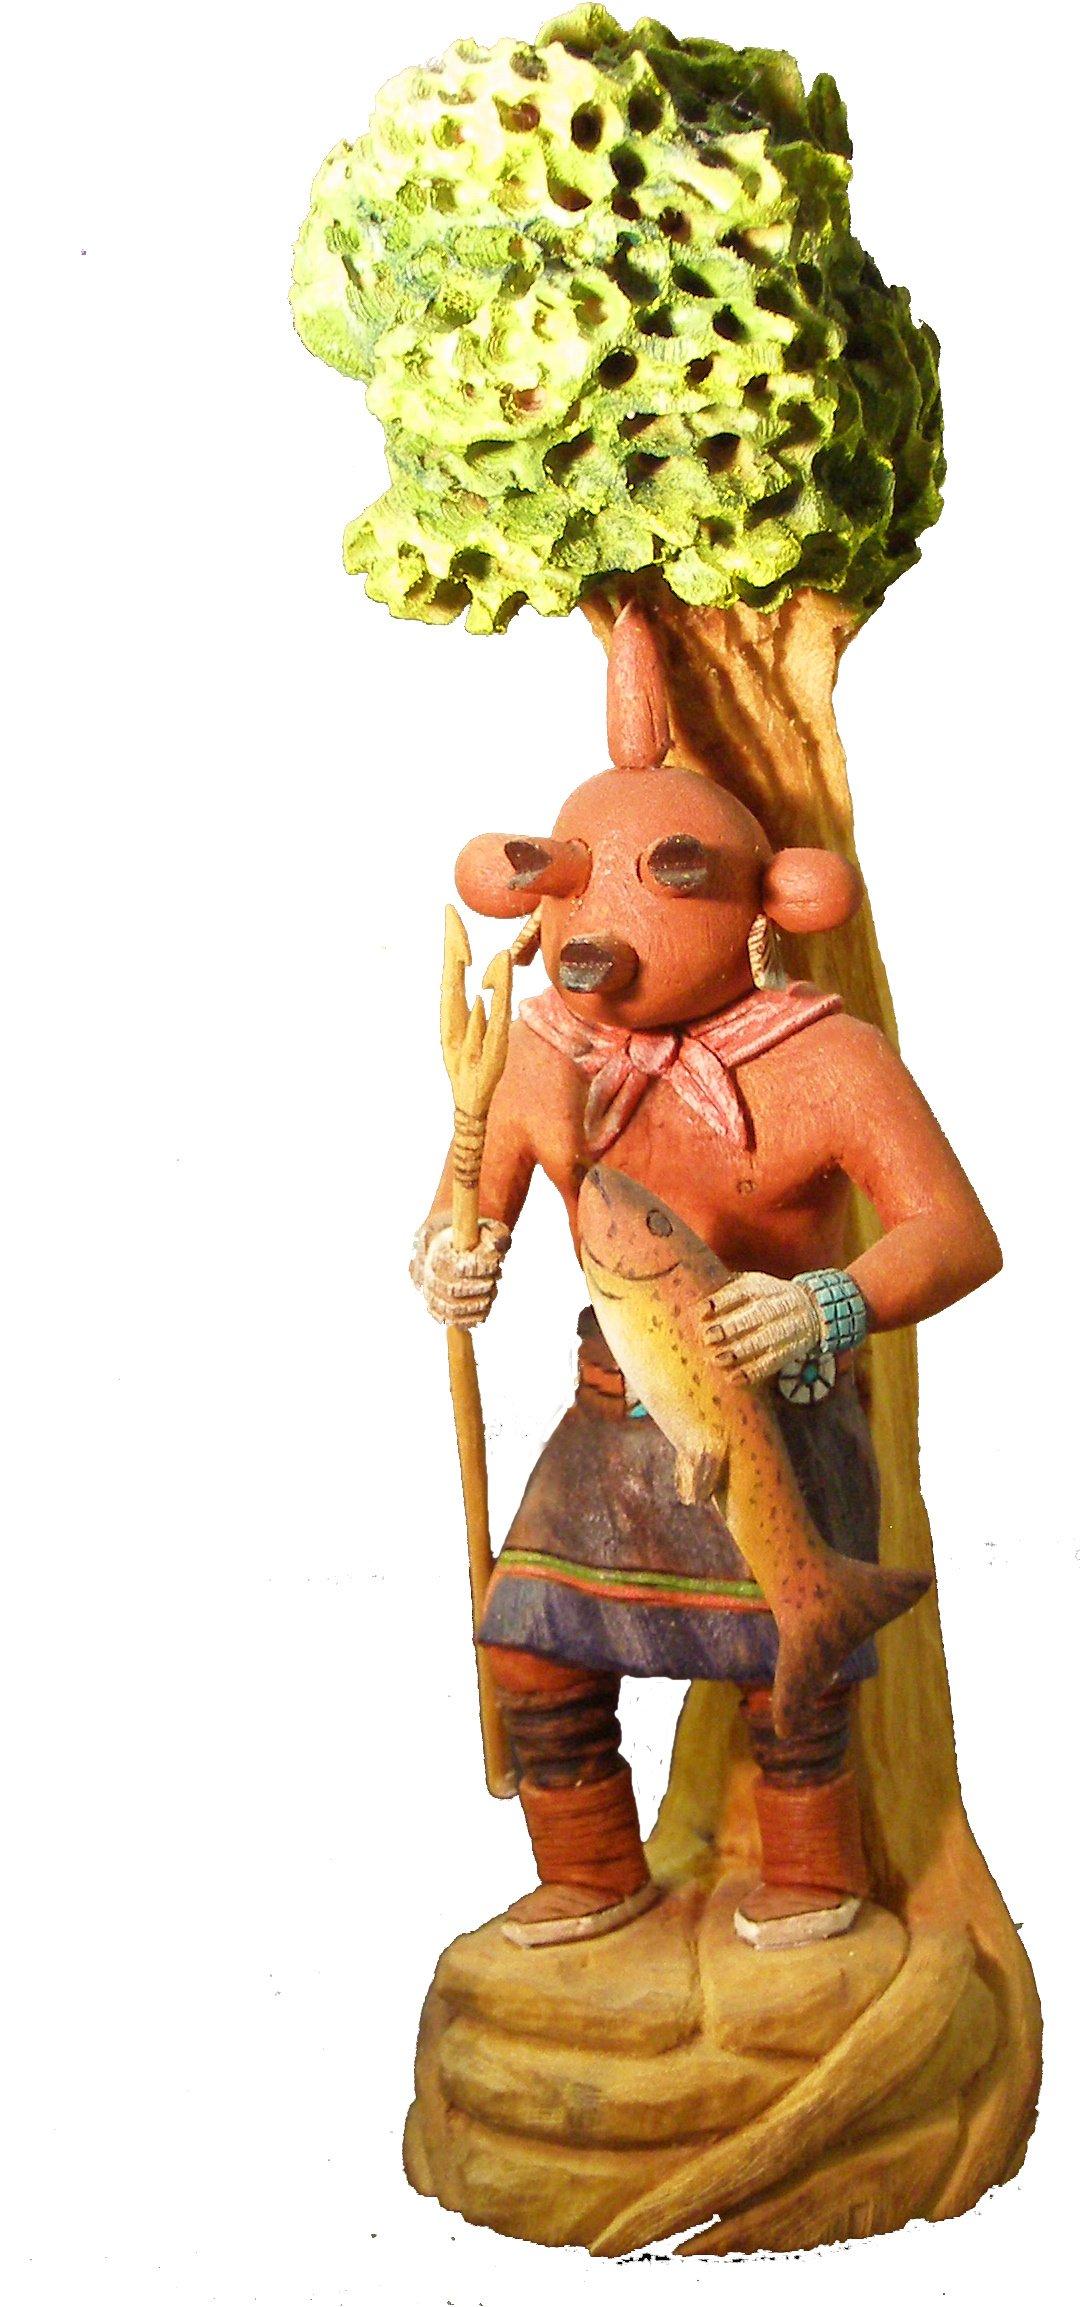 Mudhead Sculpture